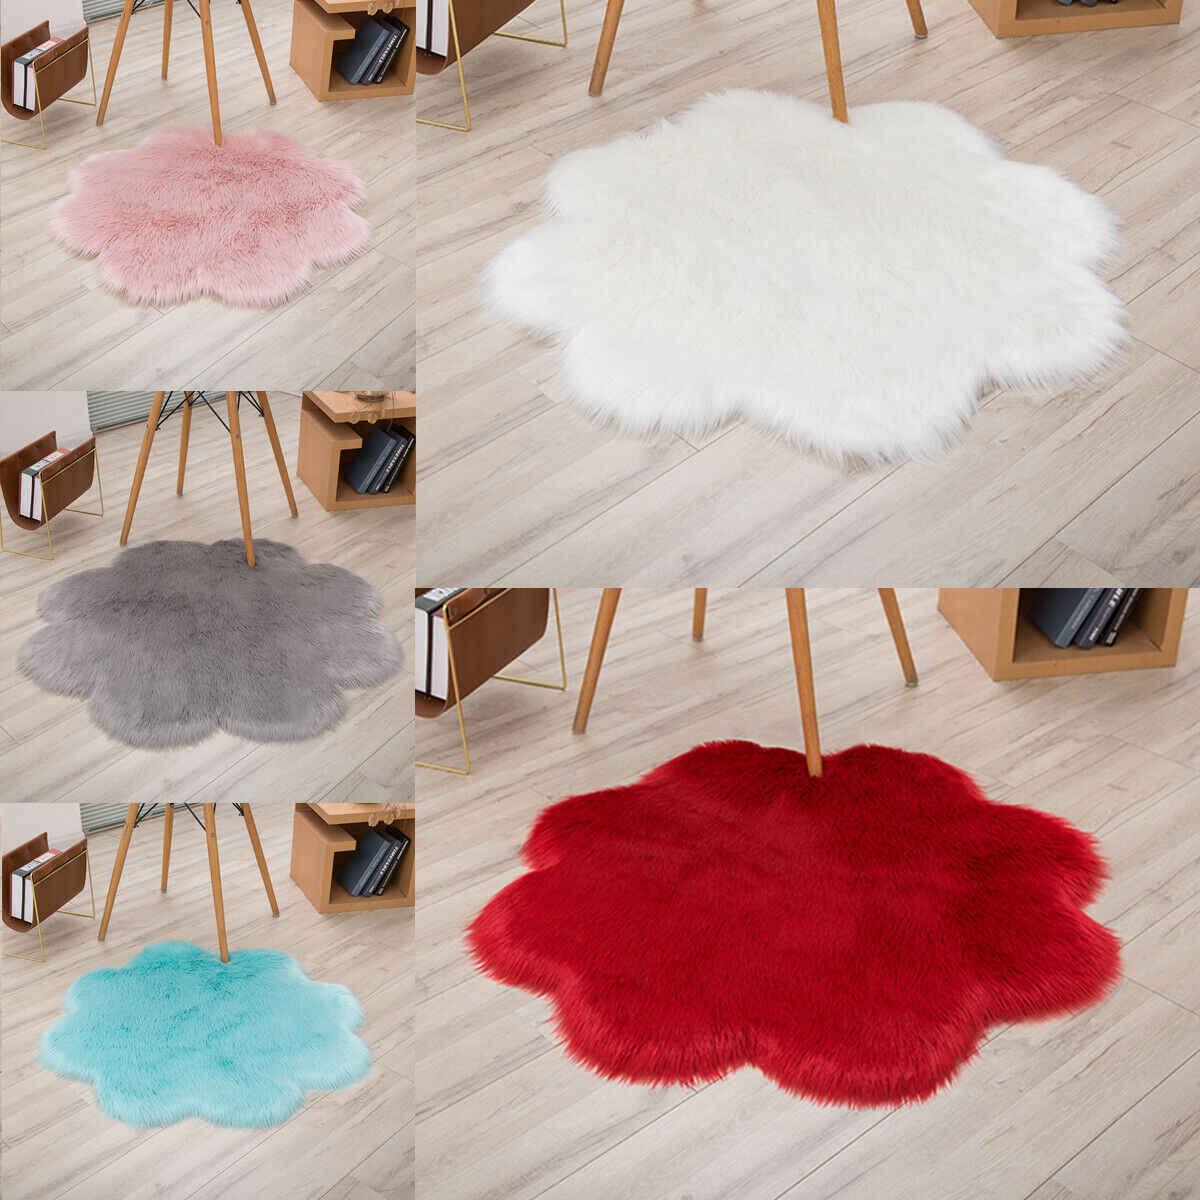 Flower Fluffy Rug Anti-Skid Shaggy Dining Room Bedroom Carpet Floor Comfortable Shaped Shaggy Hairy Carpet Floor Mat Home Decor